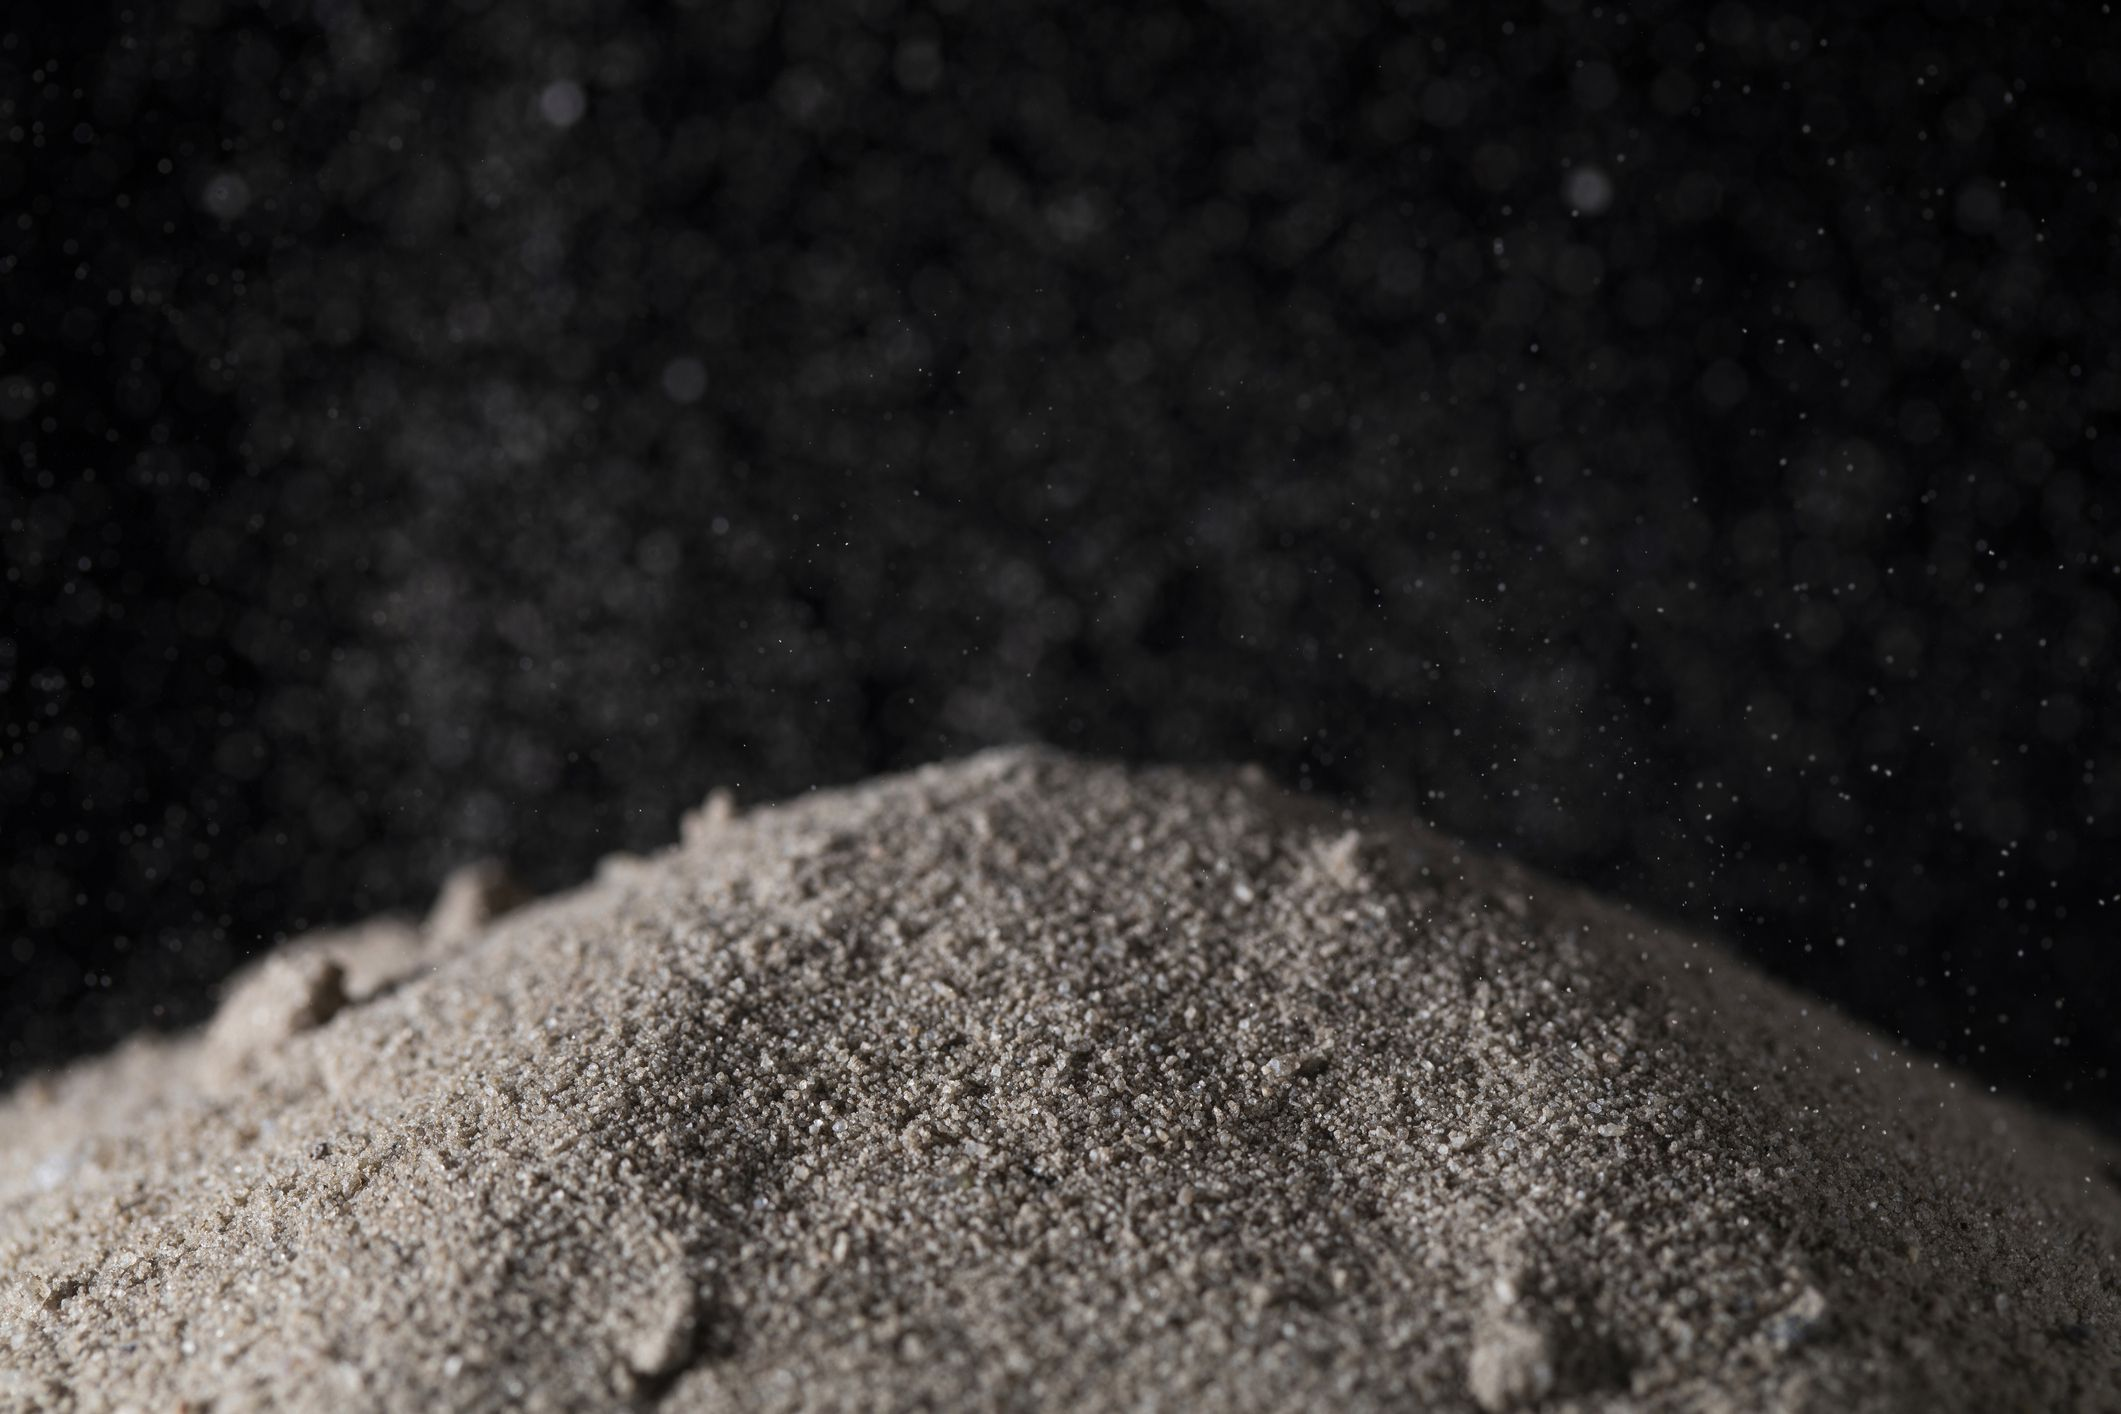 How To Do A Sedimentation Test On Soil